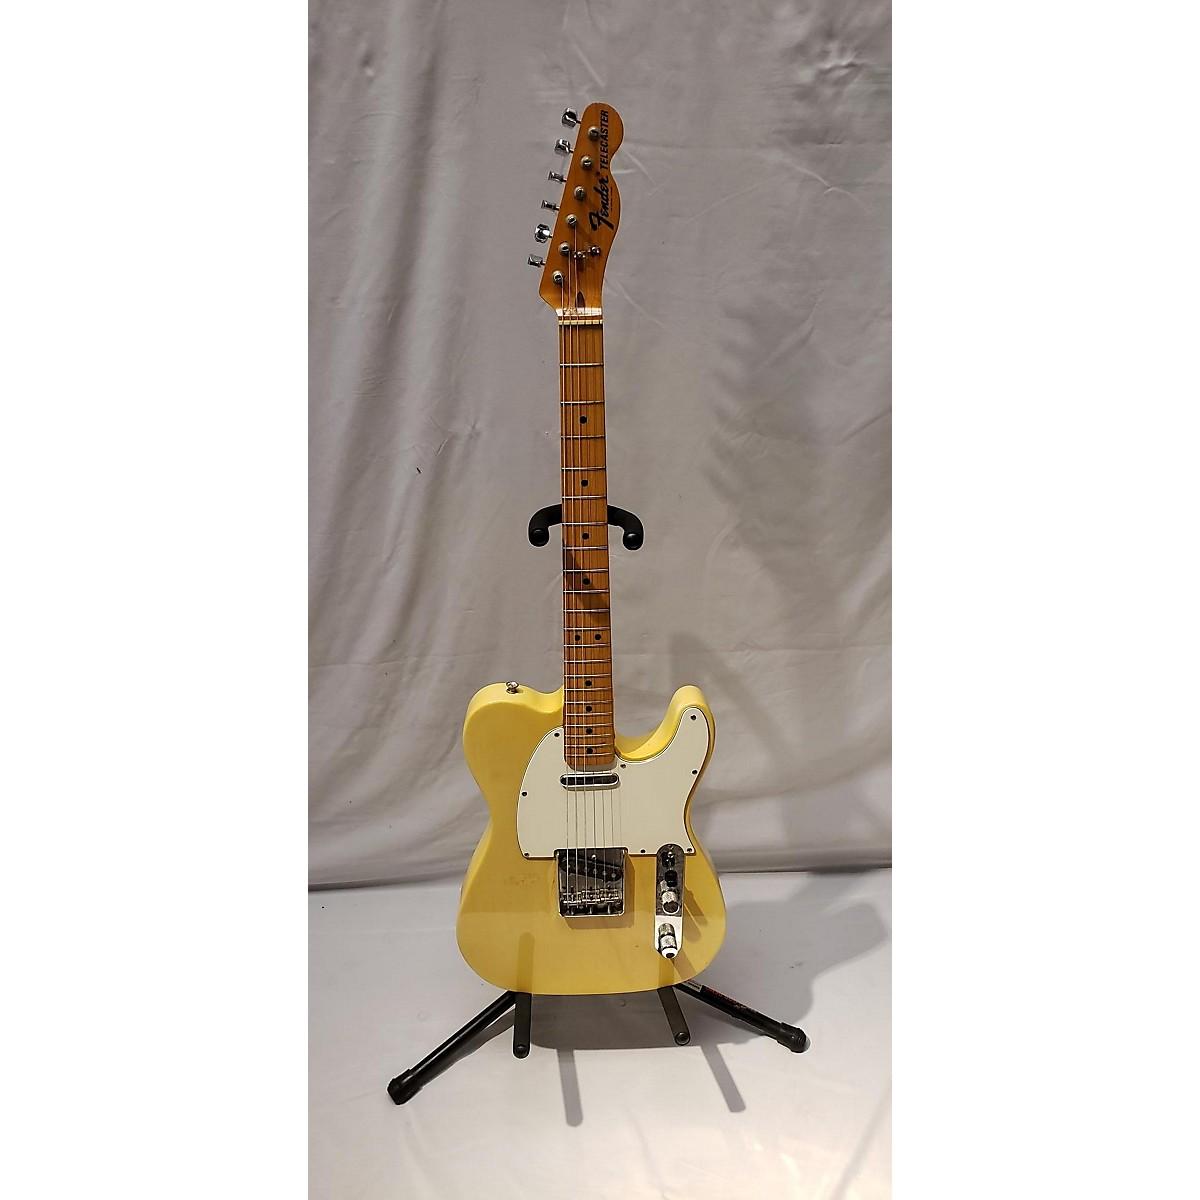 Fender 1973 1973 FENDER TELECASTER Solid Body Electric Guitar